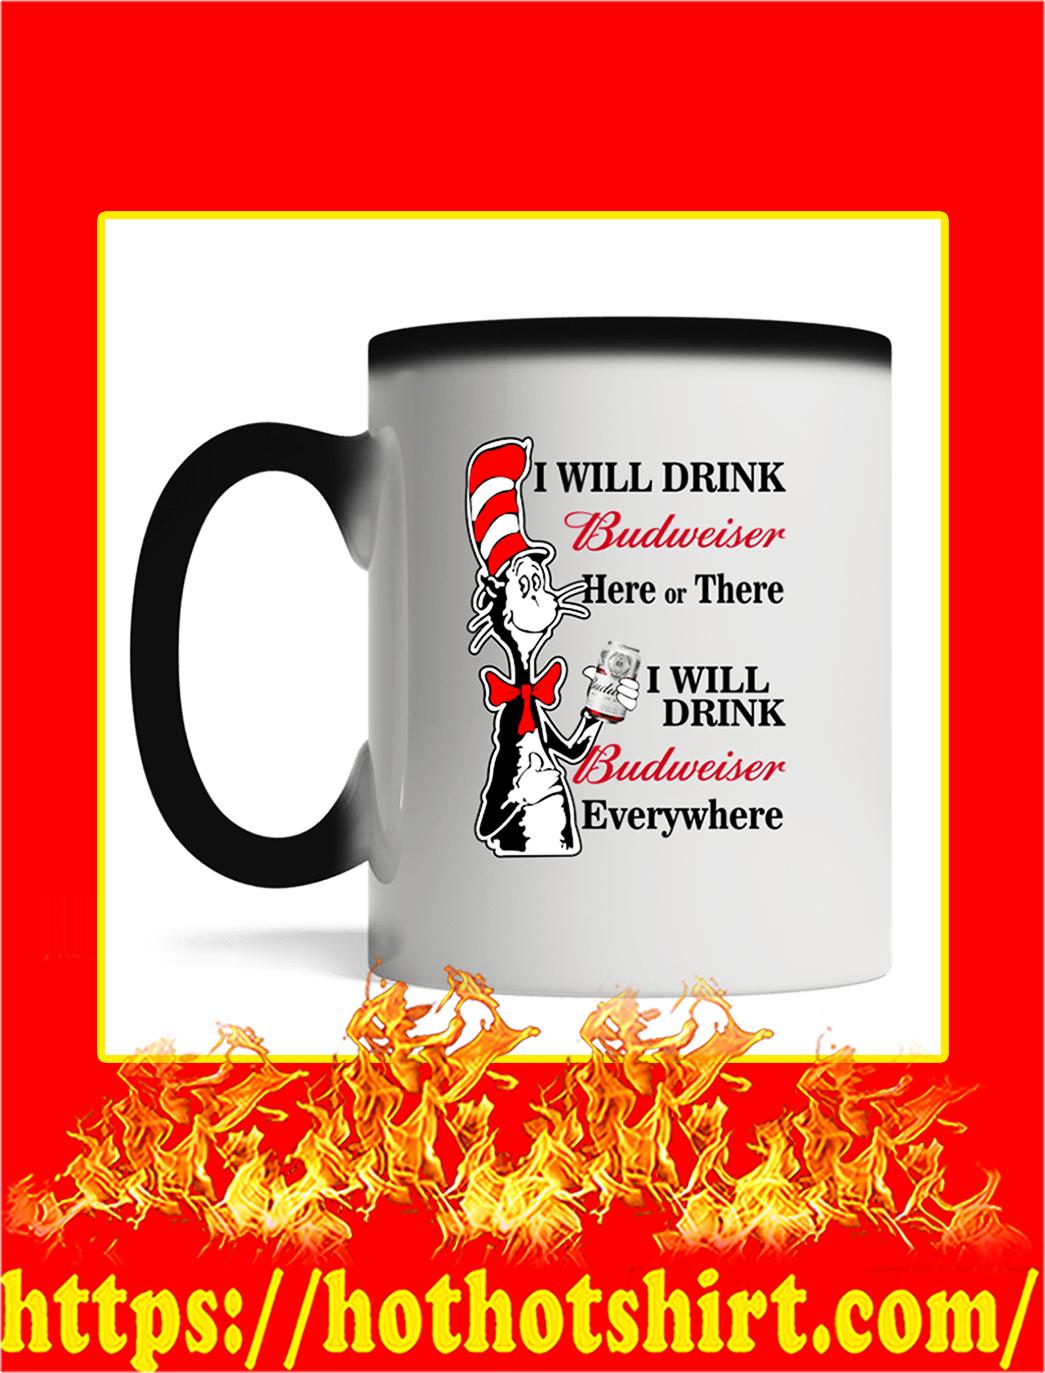 Dr Seuss I Will Drink Budweiser Here Or There Mug- magic mug